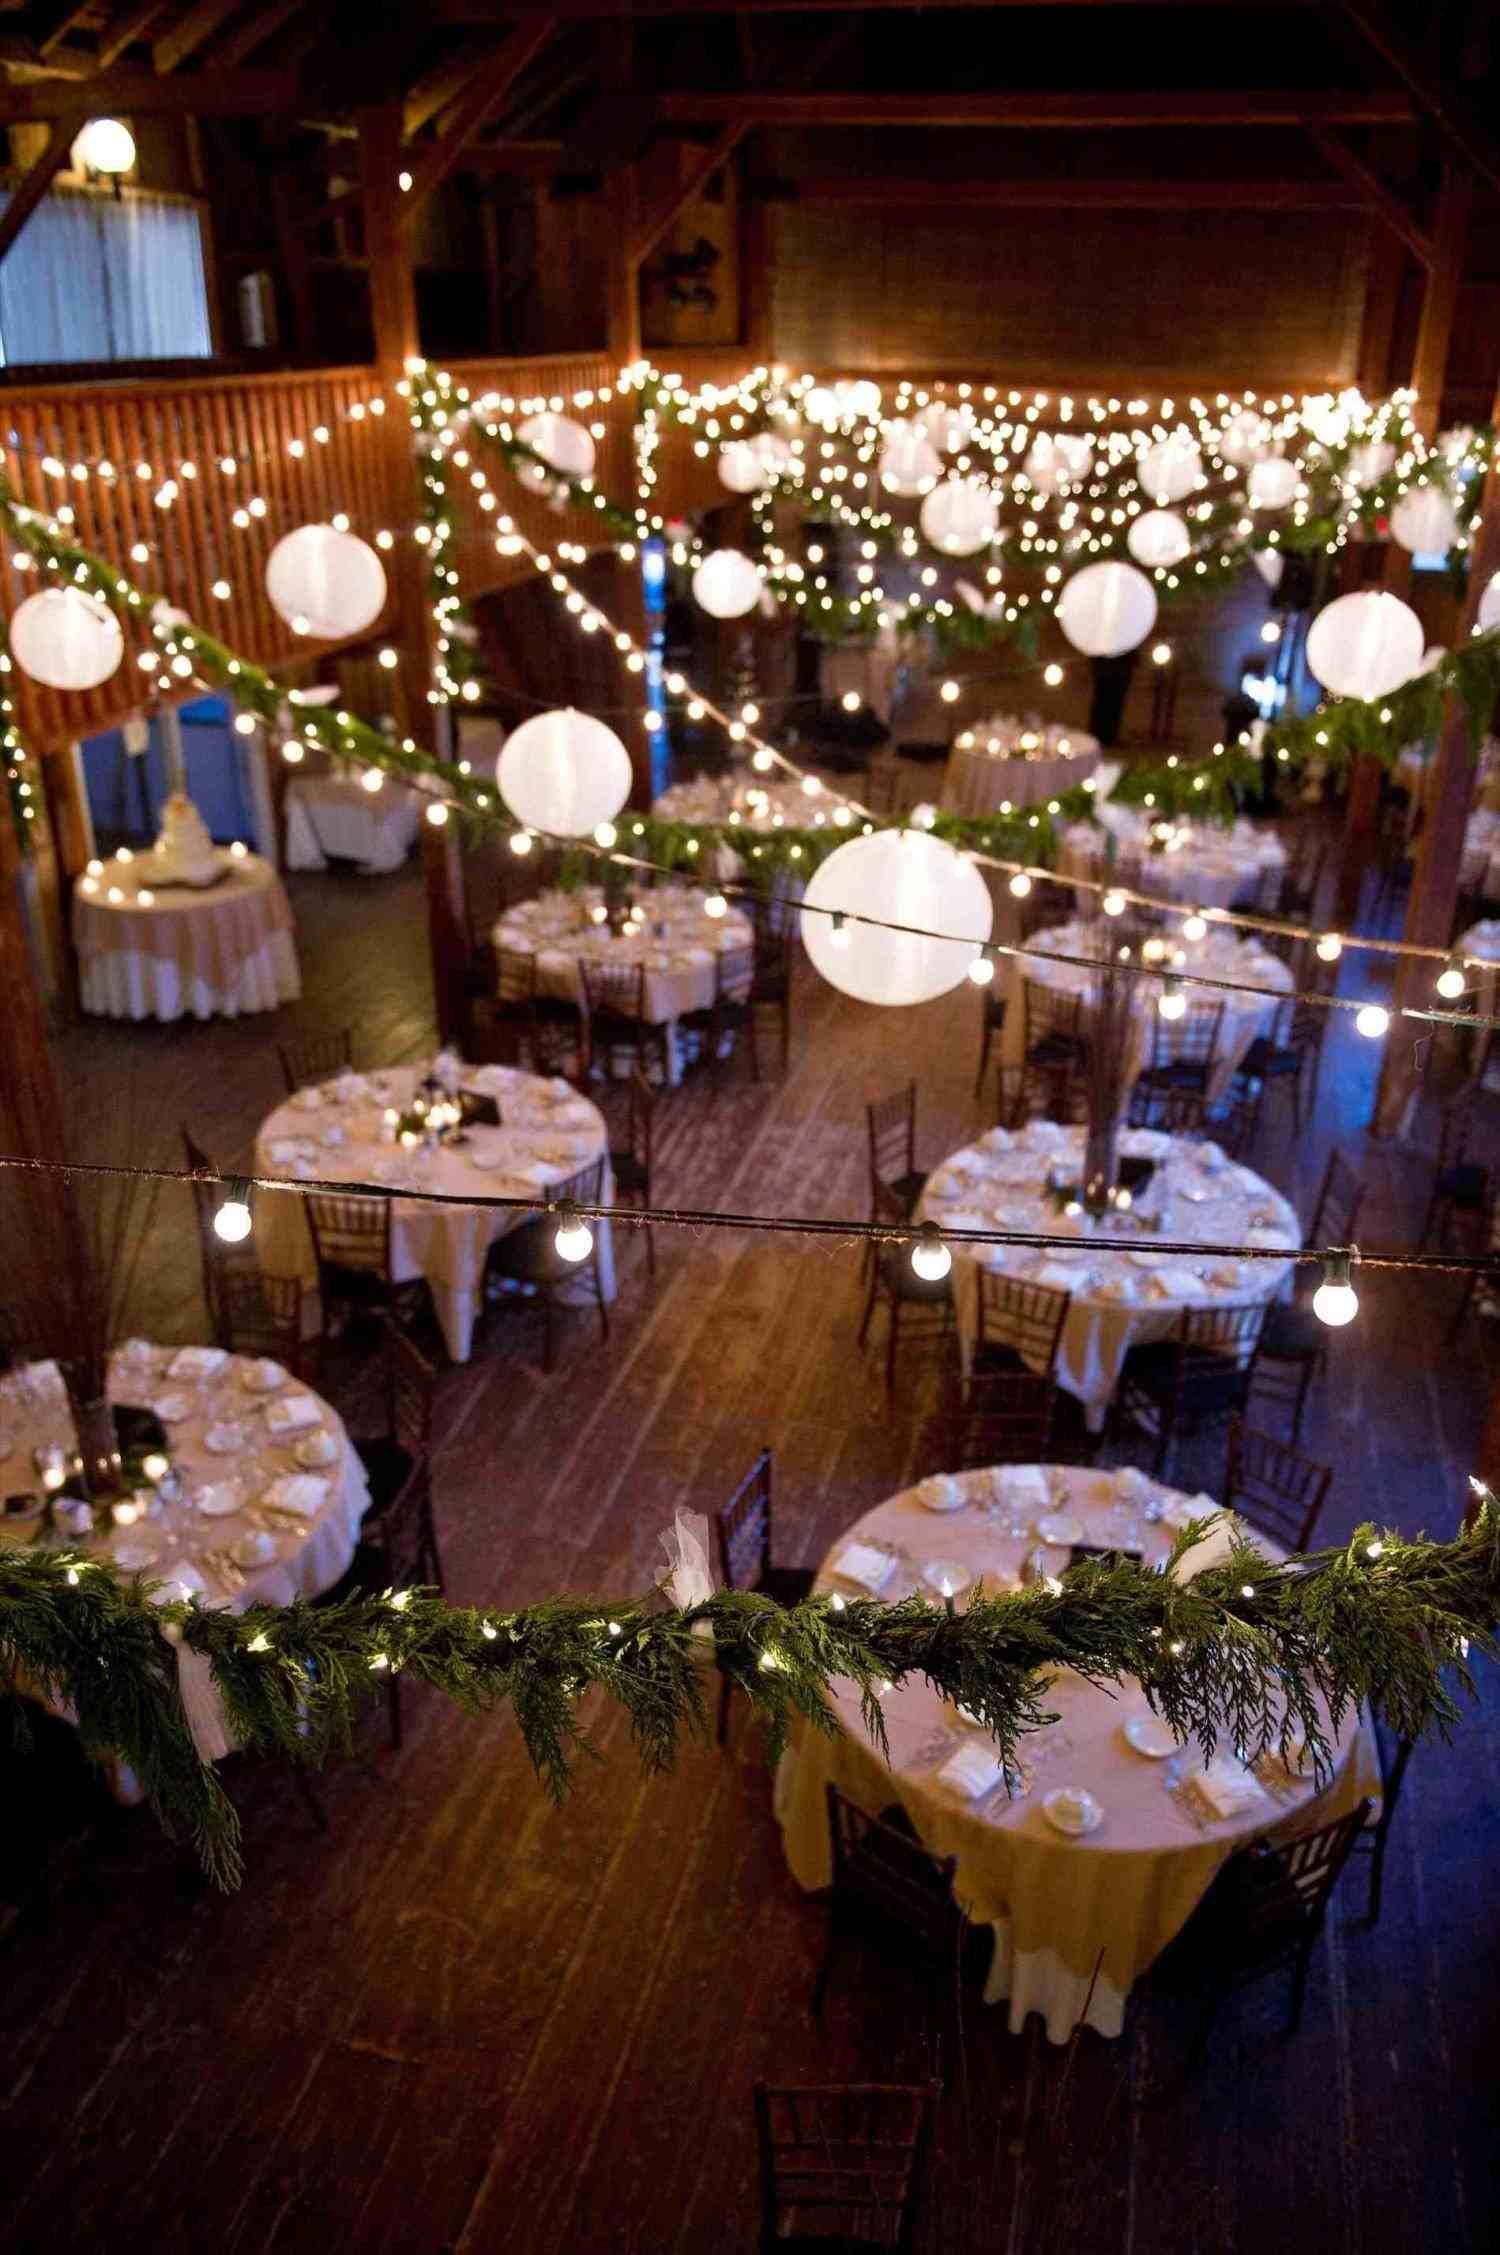 Top new post diy rustic wedding centerpieces visit wedbridal